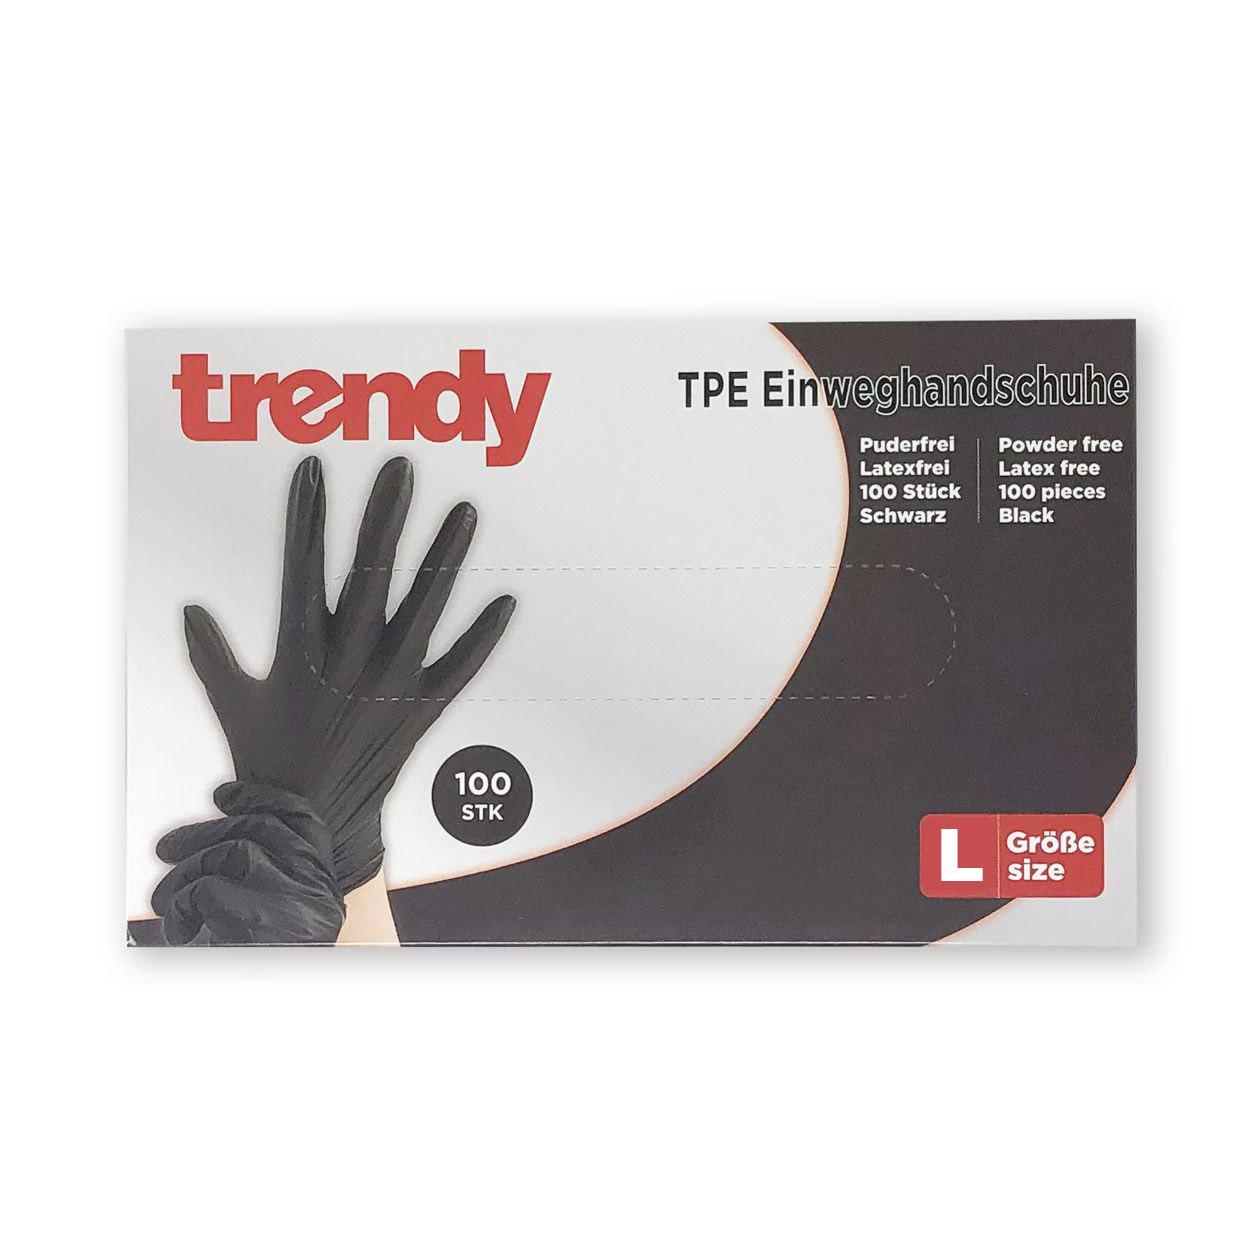 trendy Einweghandschuhe - Packung à 100 Stück